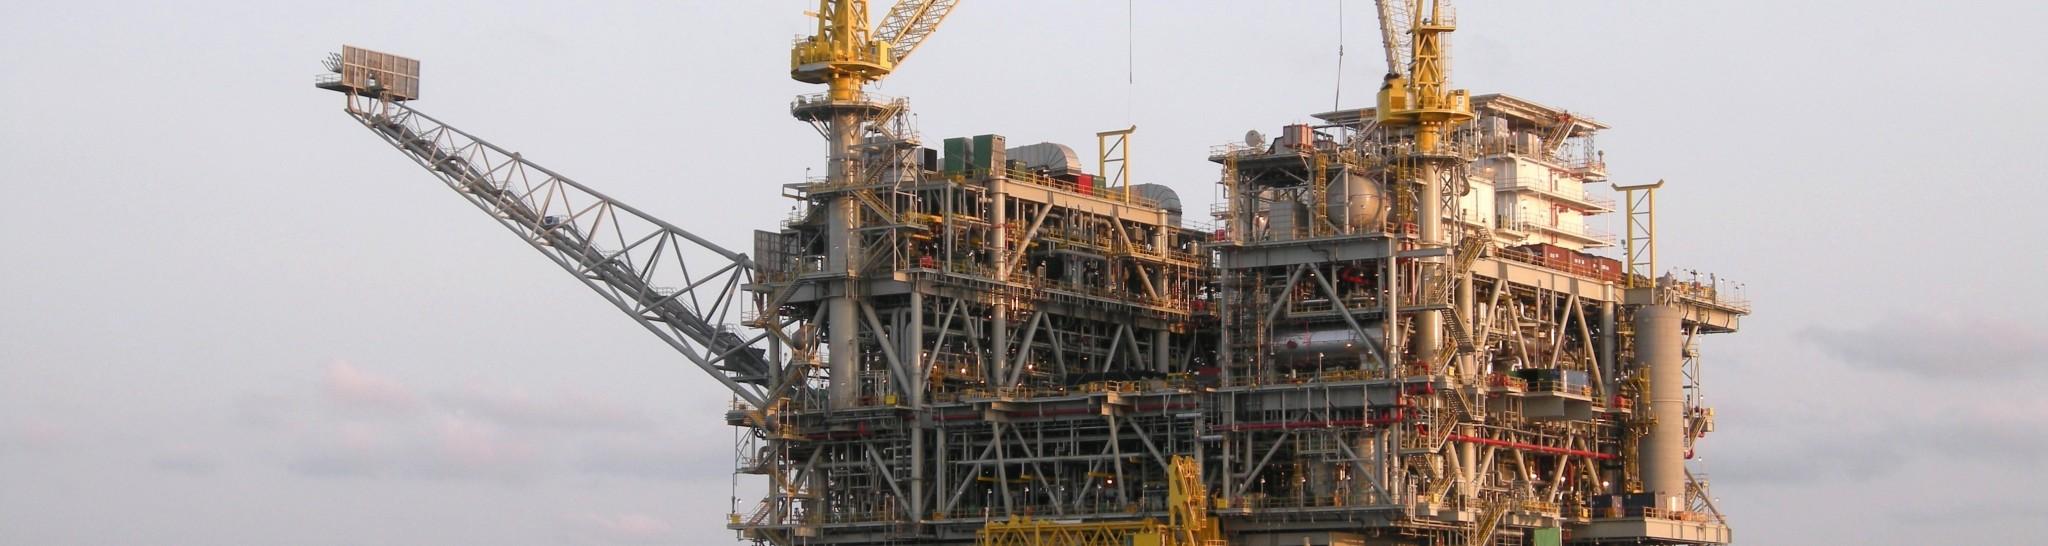 shutterstock_45363307 Angola oil rig